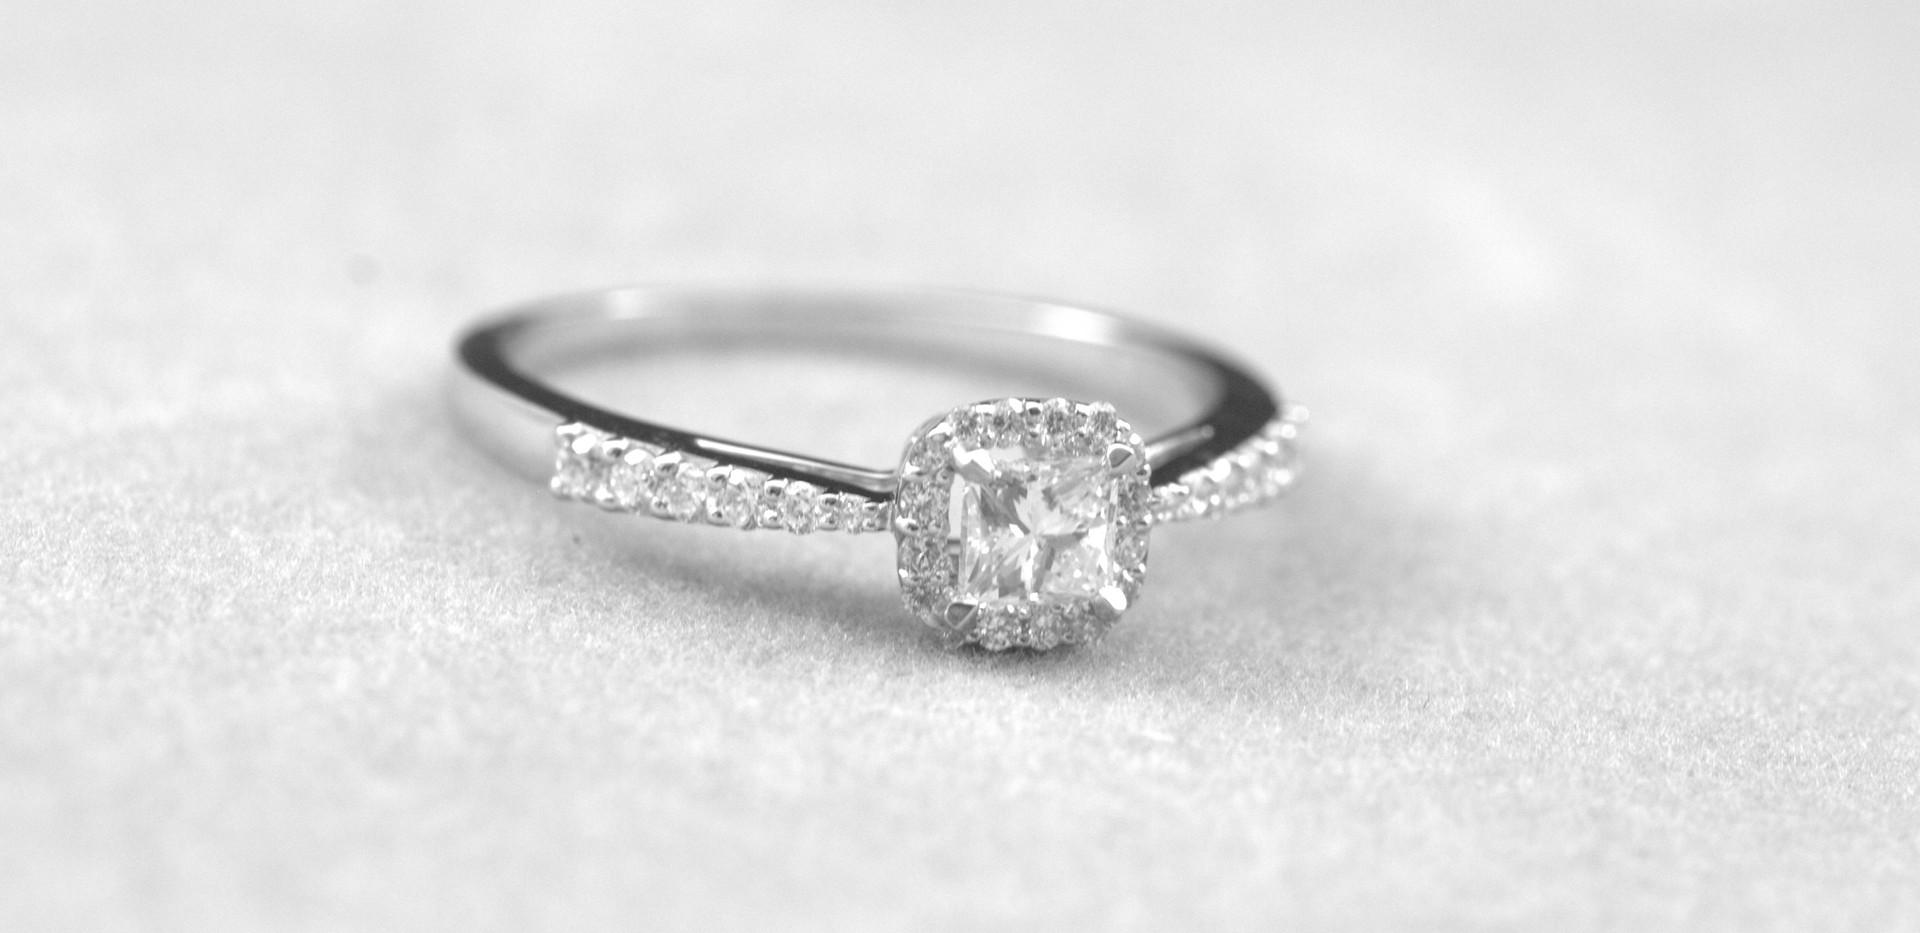 Solitario oro blanco 18 k diamantes_